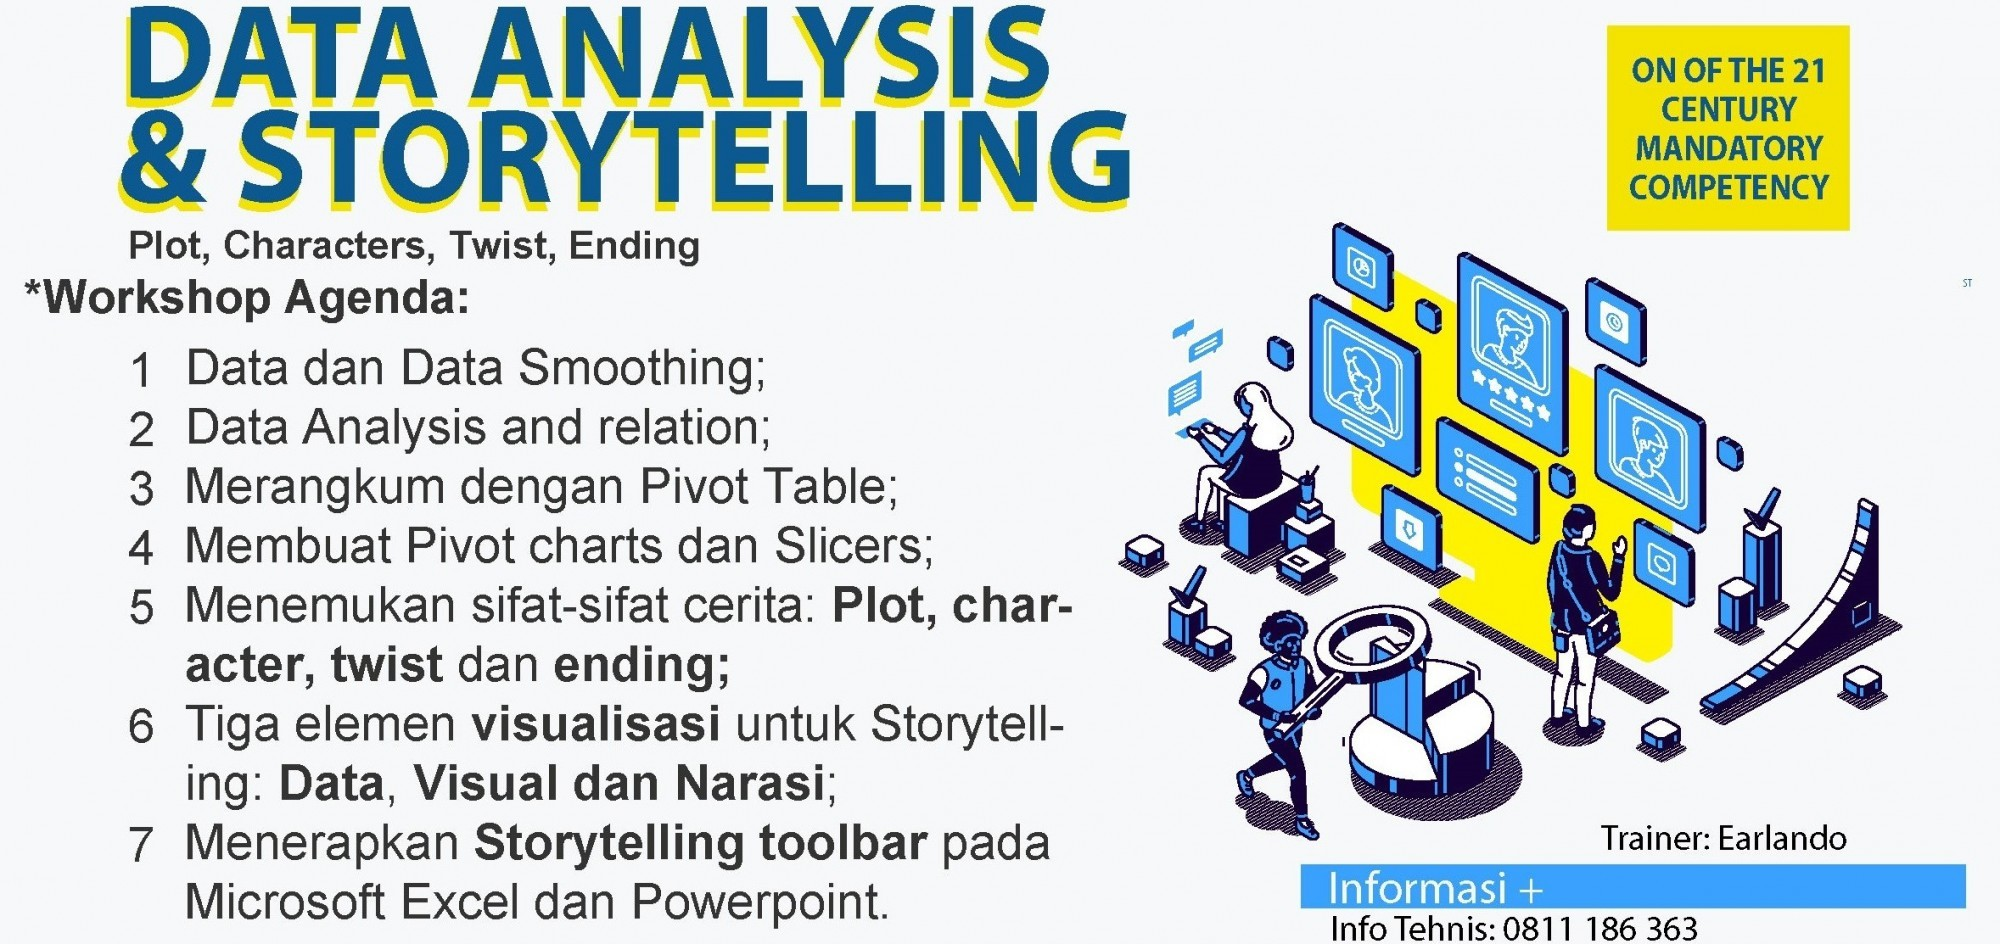 DATA ANALYSIS & STORYTELLING